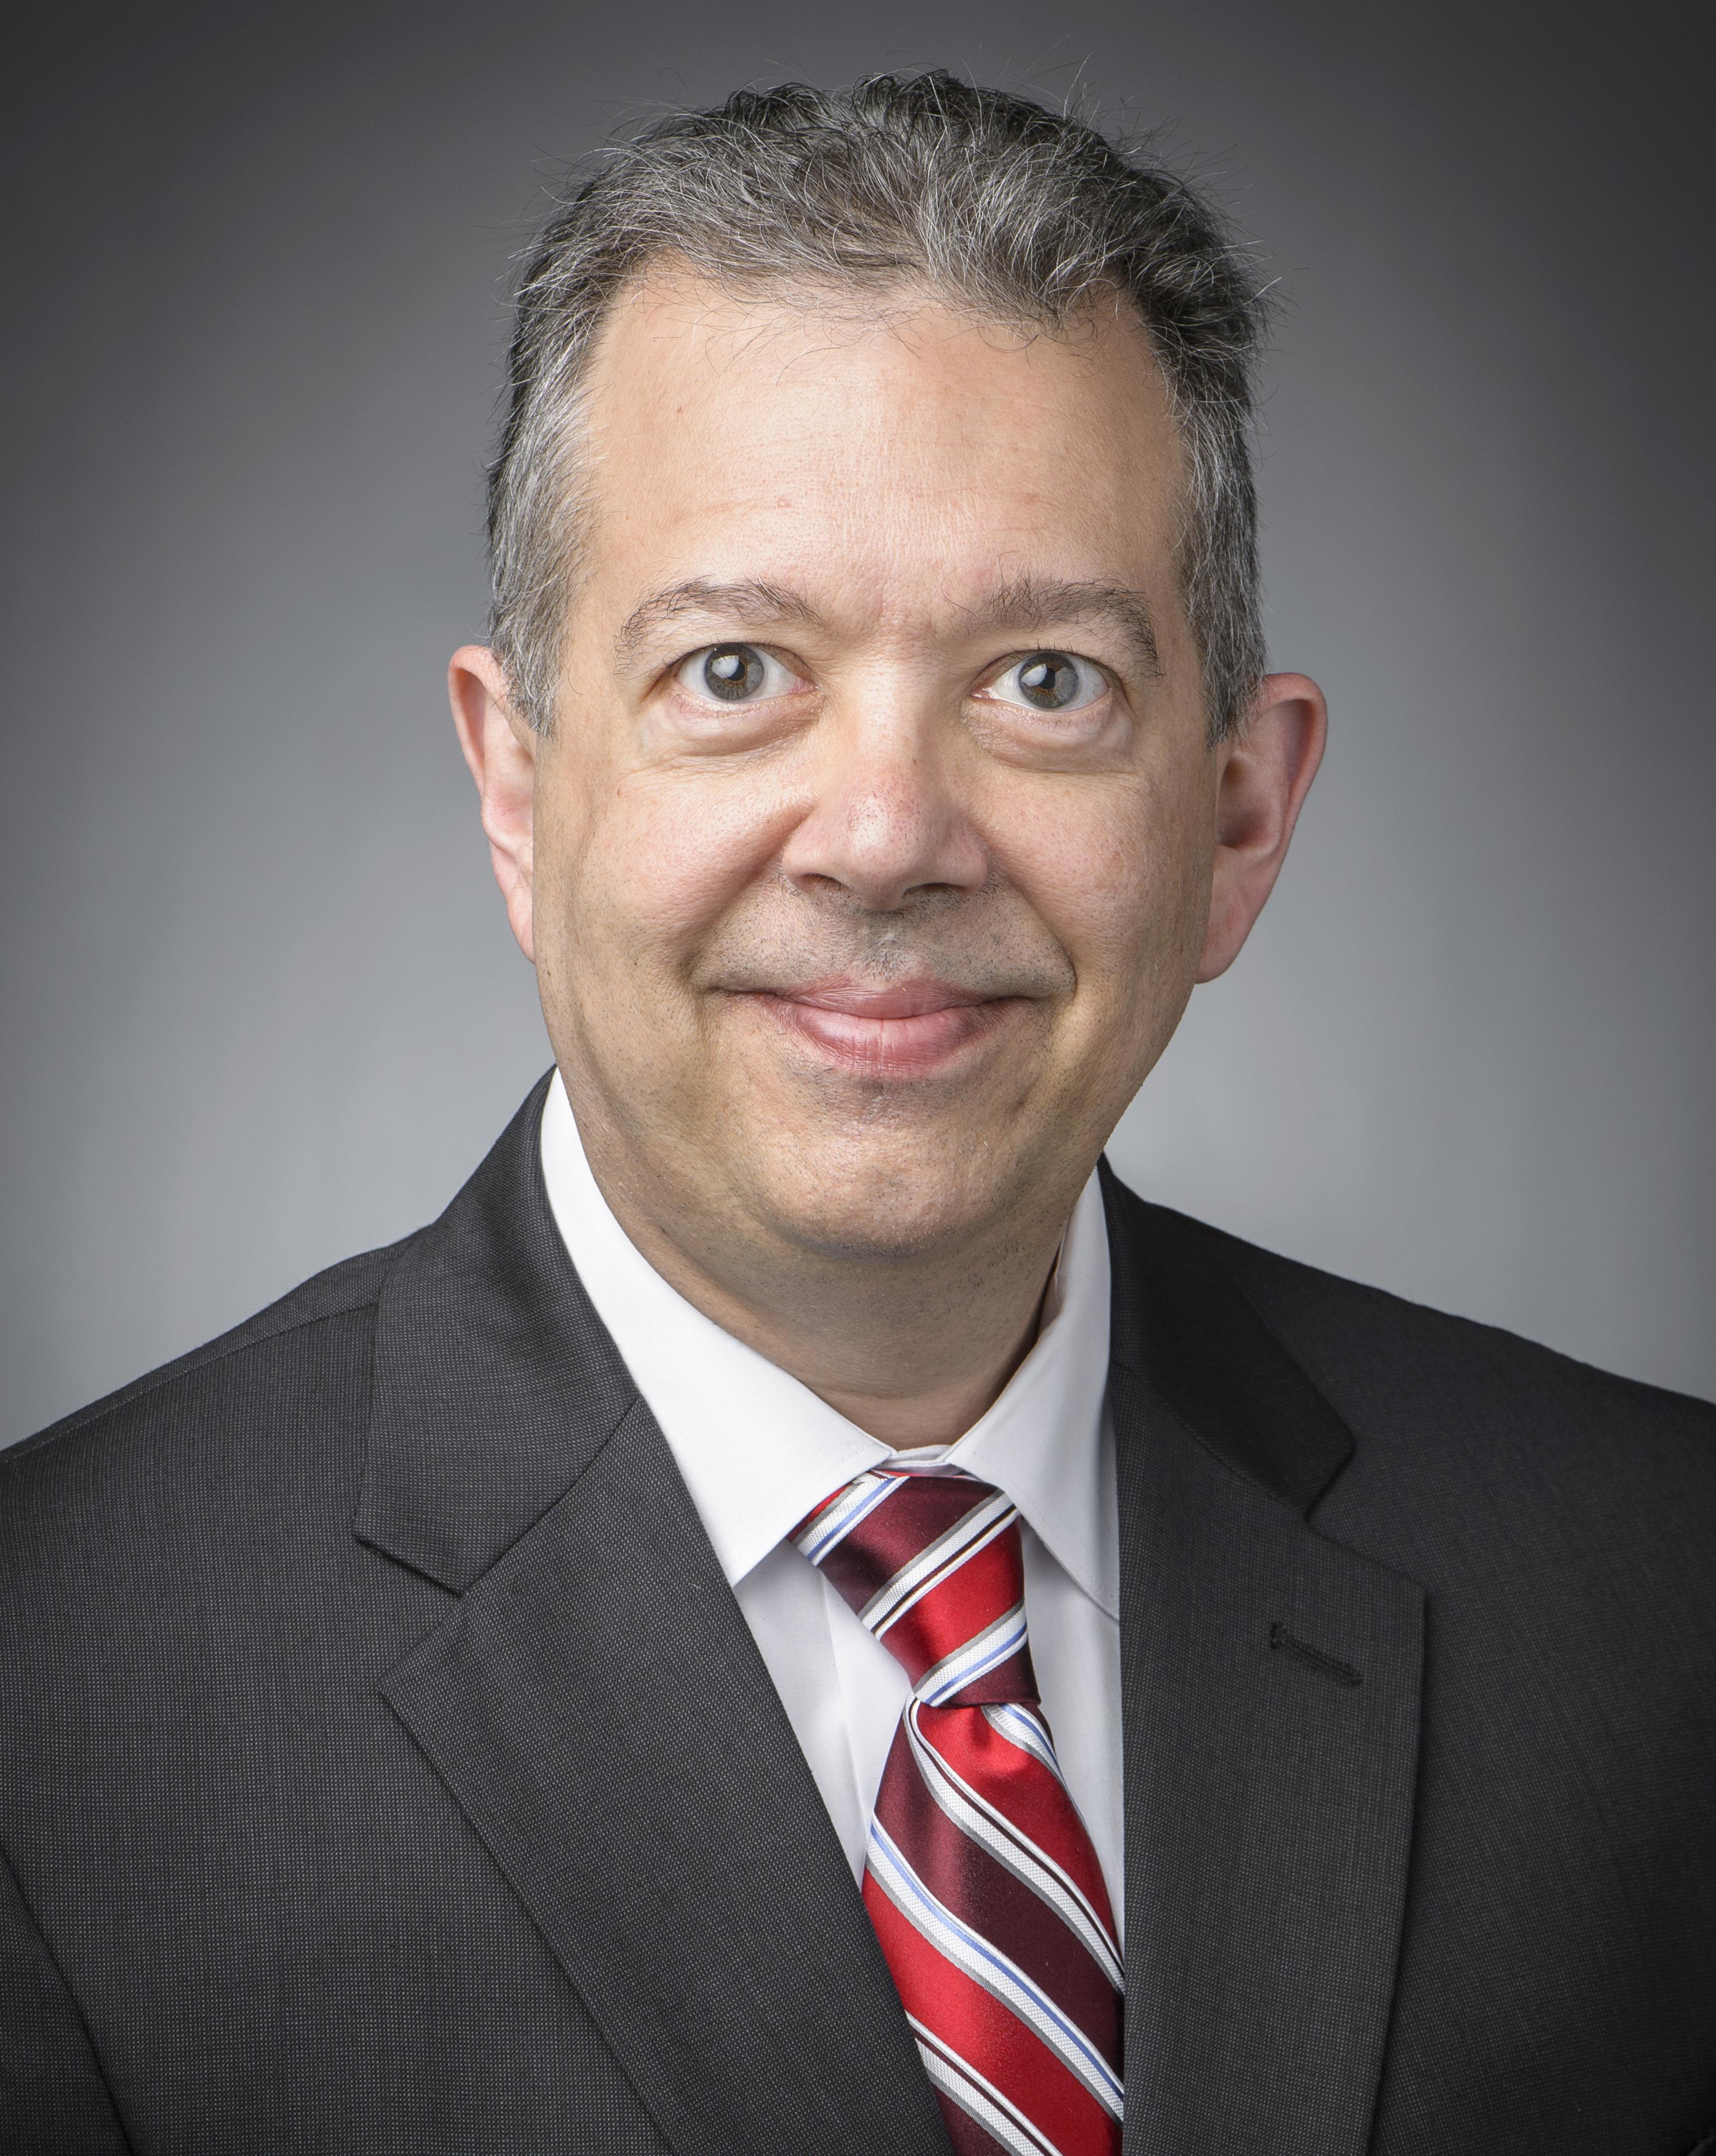 William J. Karpus